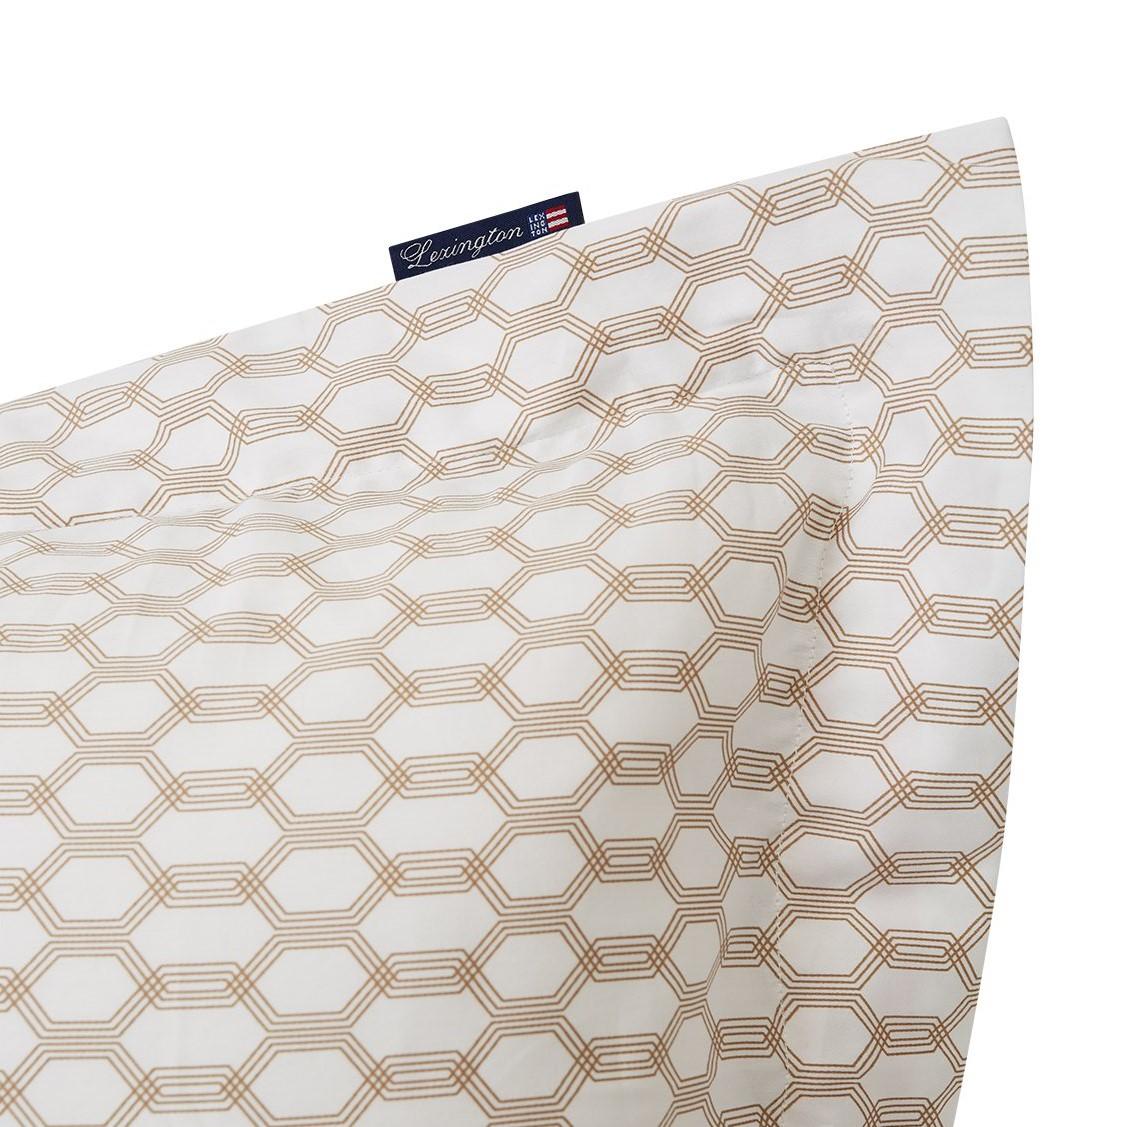 "LEXINGTON COMPANY - Bettdeckenbezug ""Printed Cotton Sateen"""